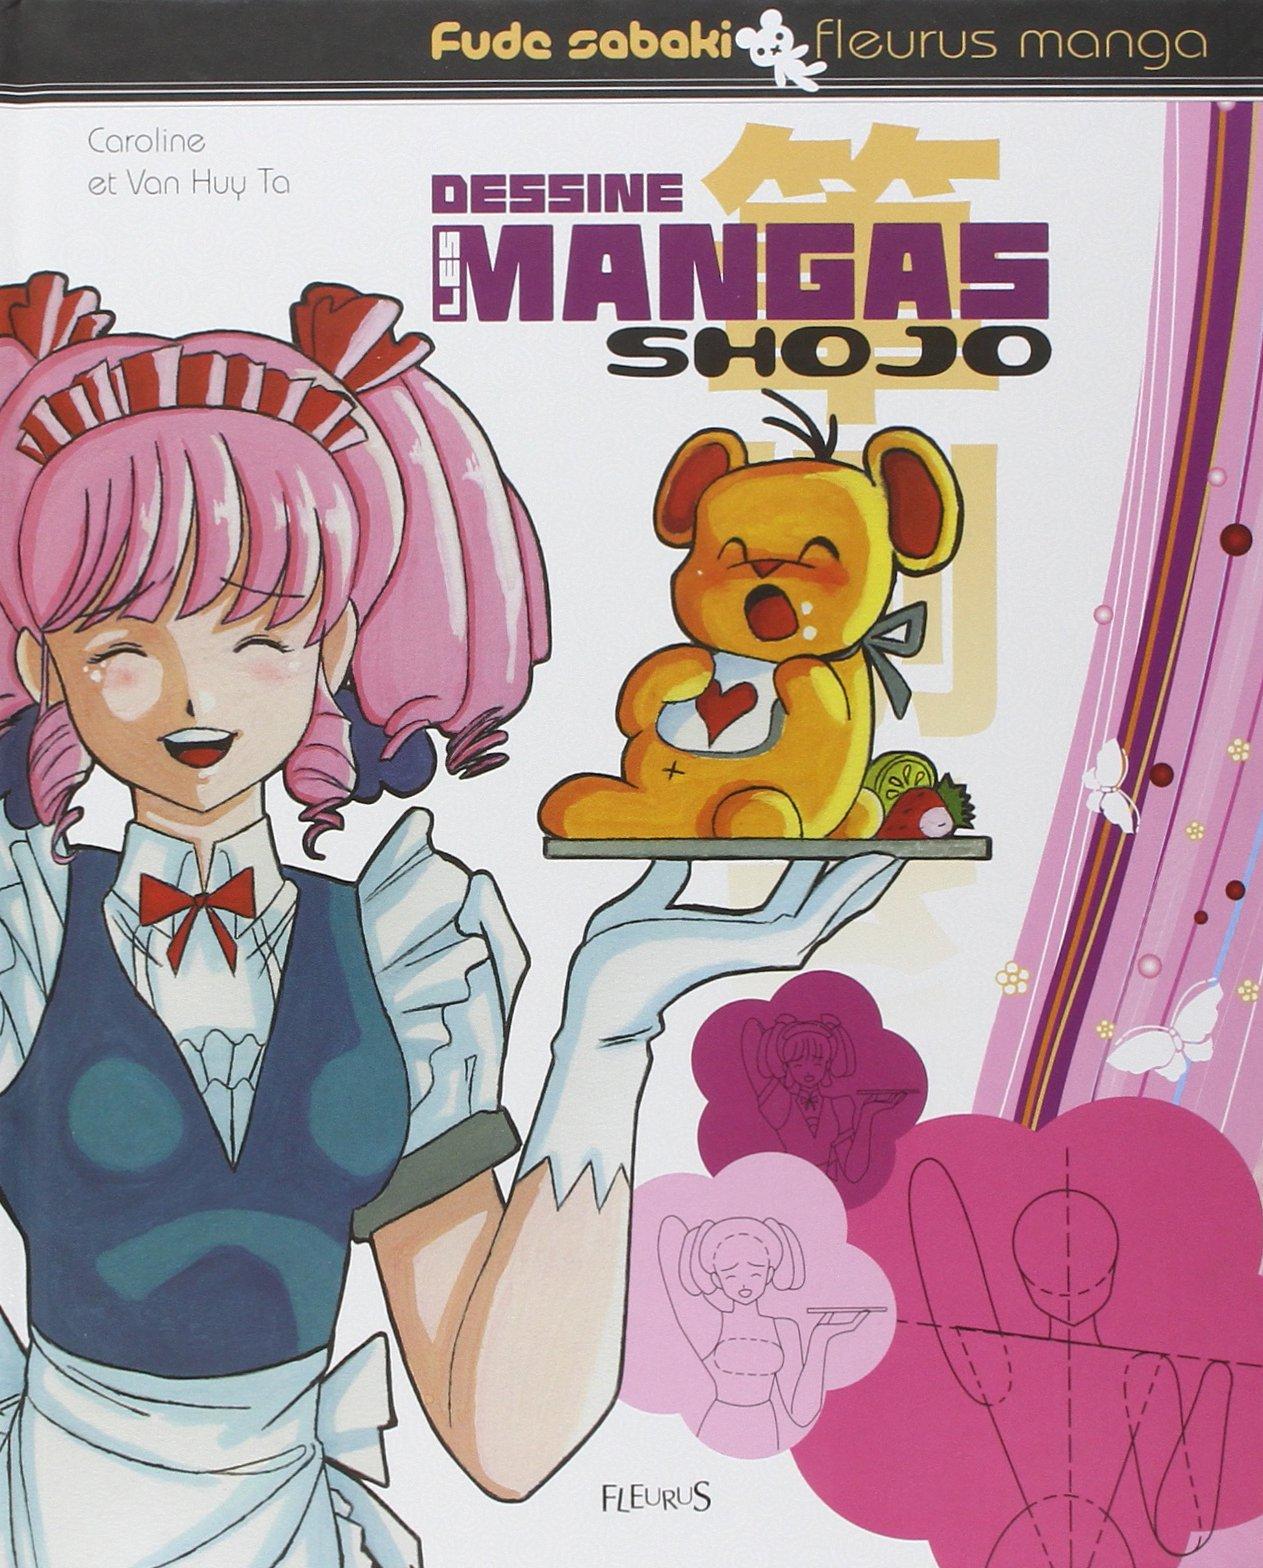 Dessine les mangas Shojo Album – 13 octobre 2005 Van Huy Ta Caroline Ta Fleurus 221507700X